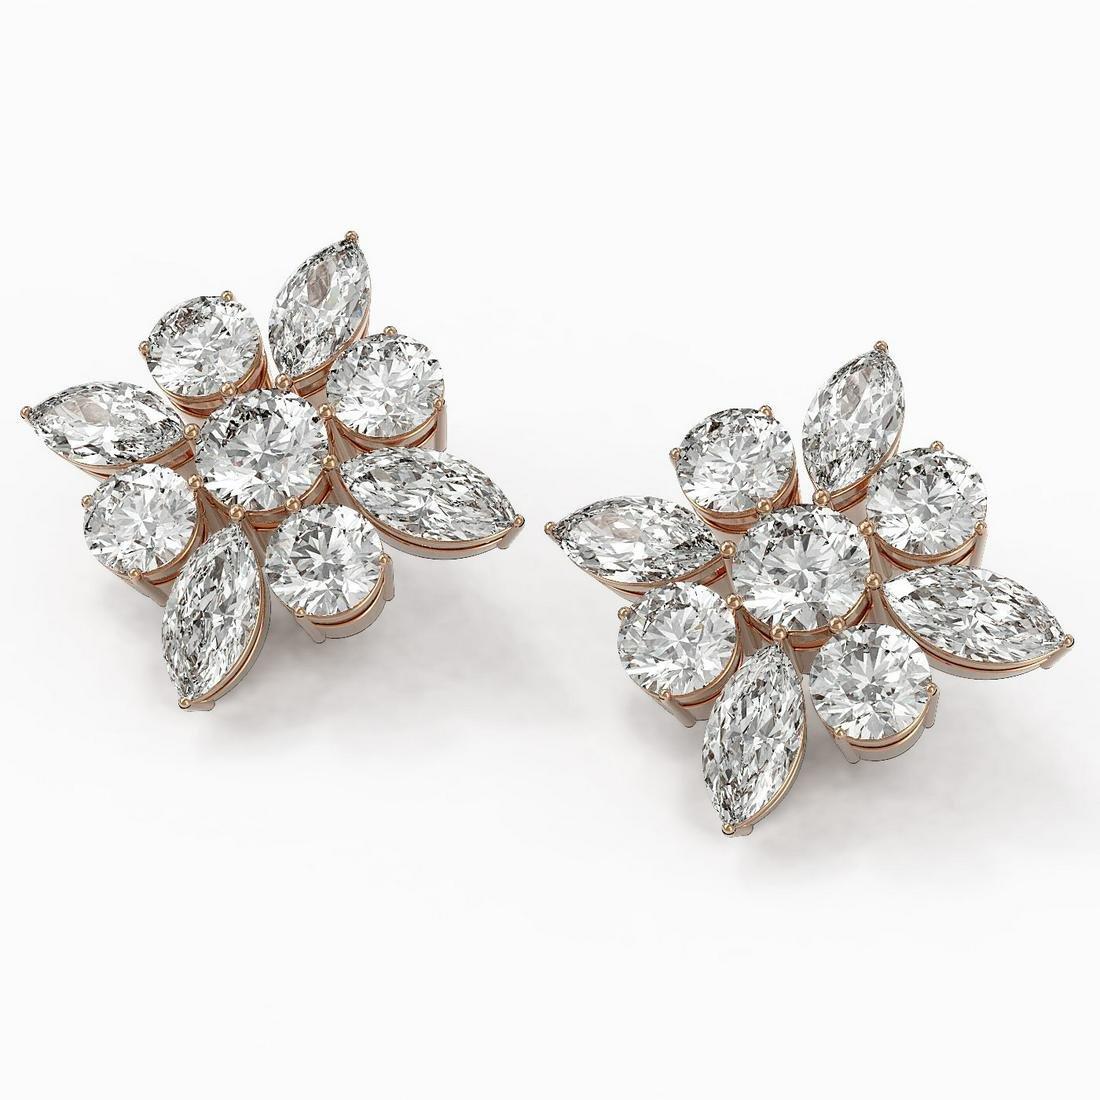 9.86 ctw Marquise Cut Diamond Designer Earrings 18K